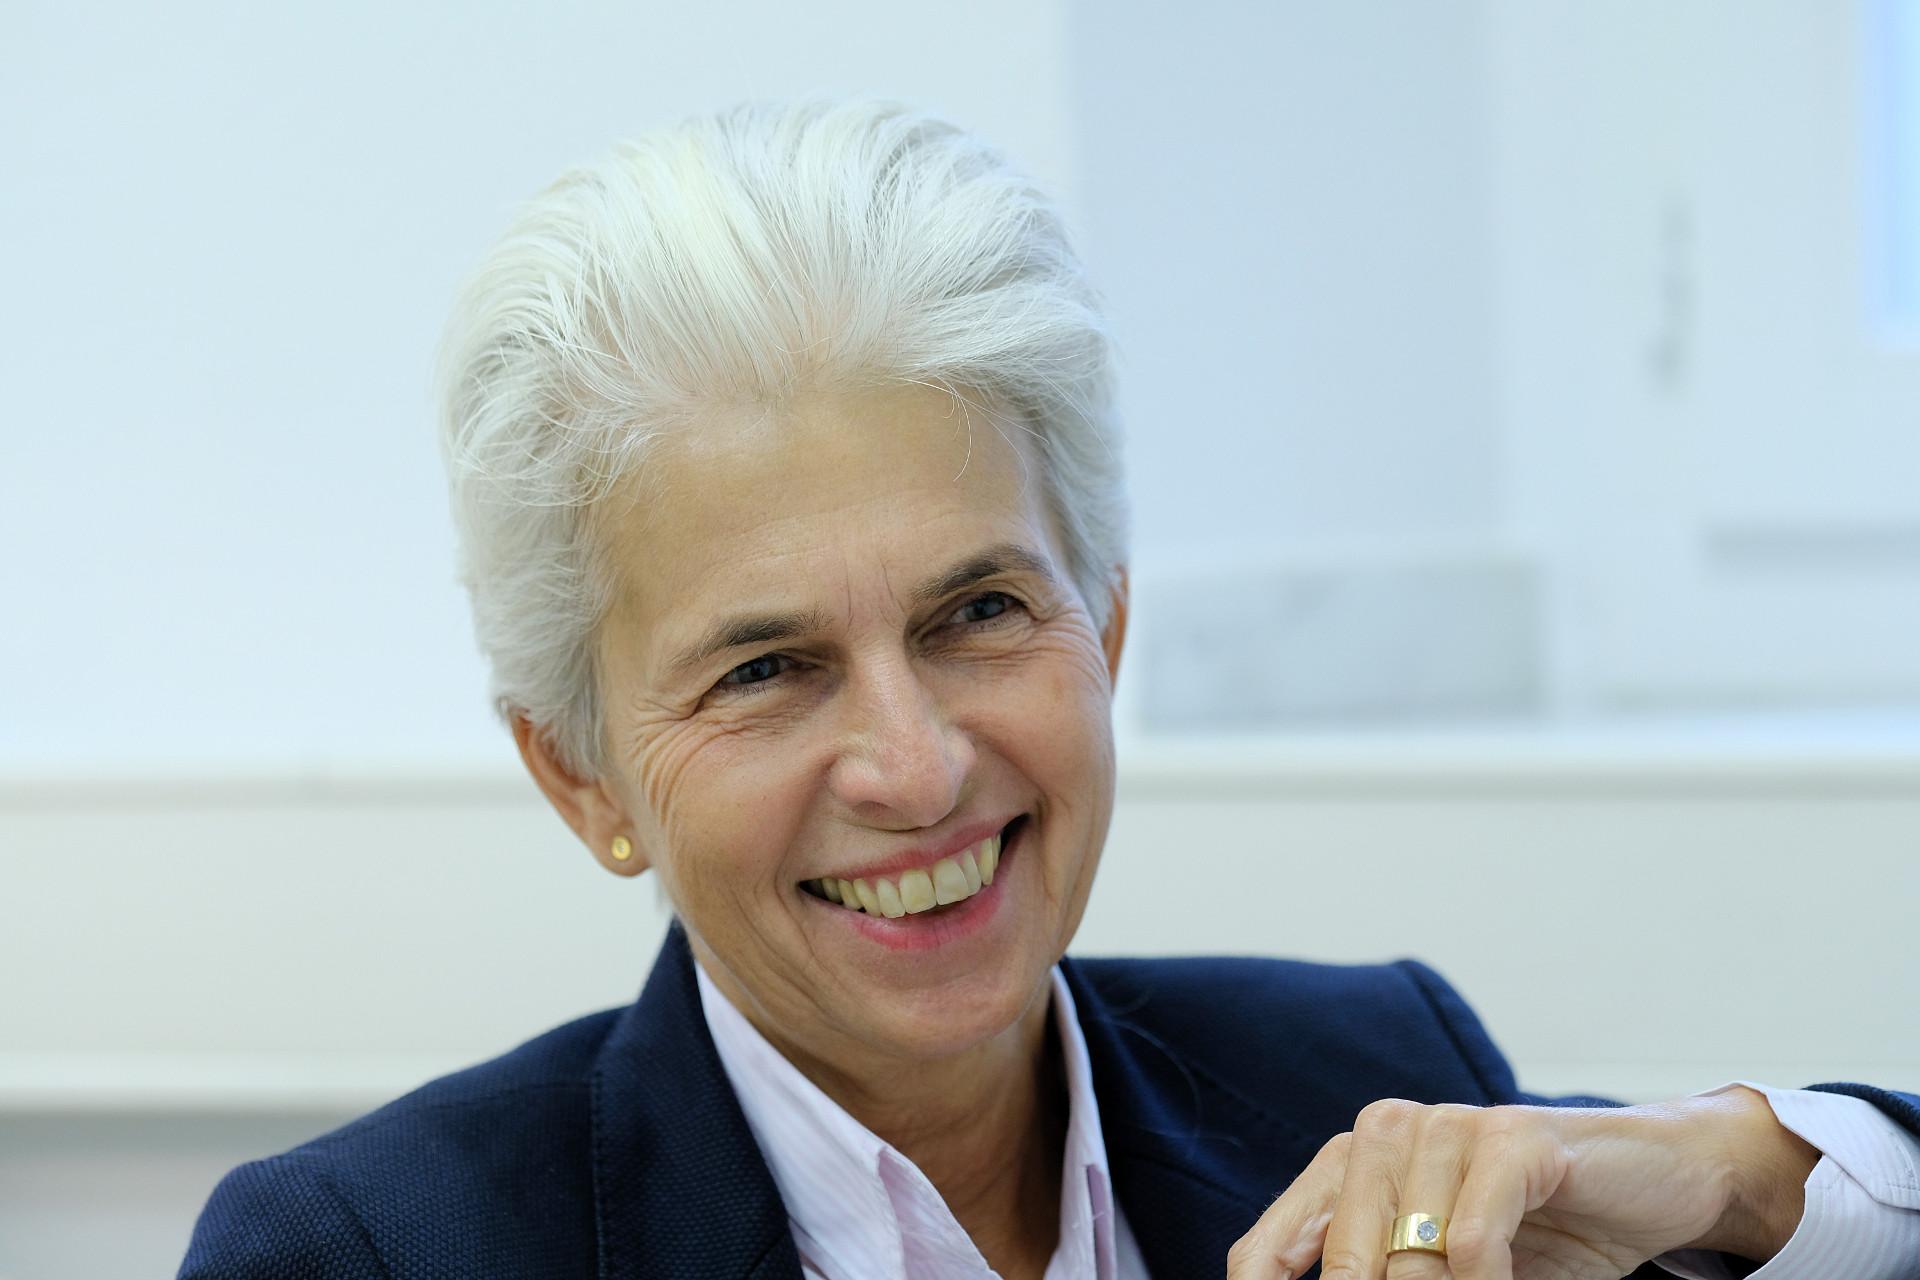 Dr. Strack-Zimmermann